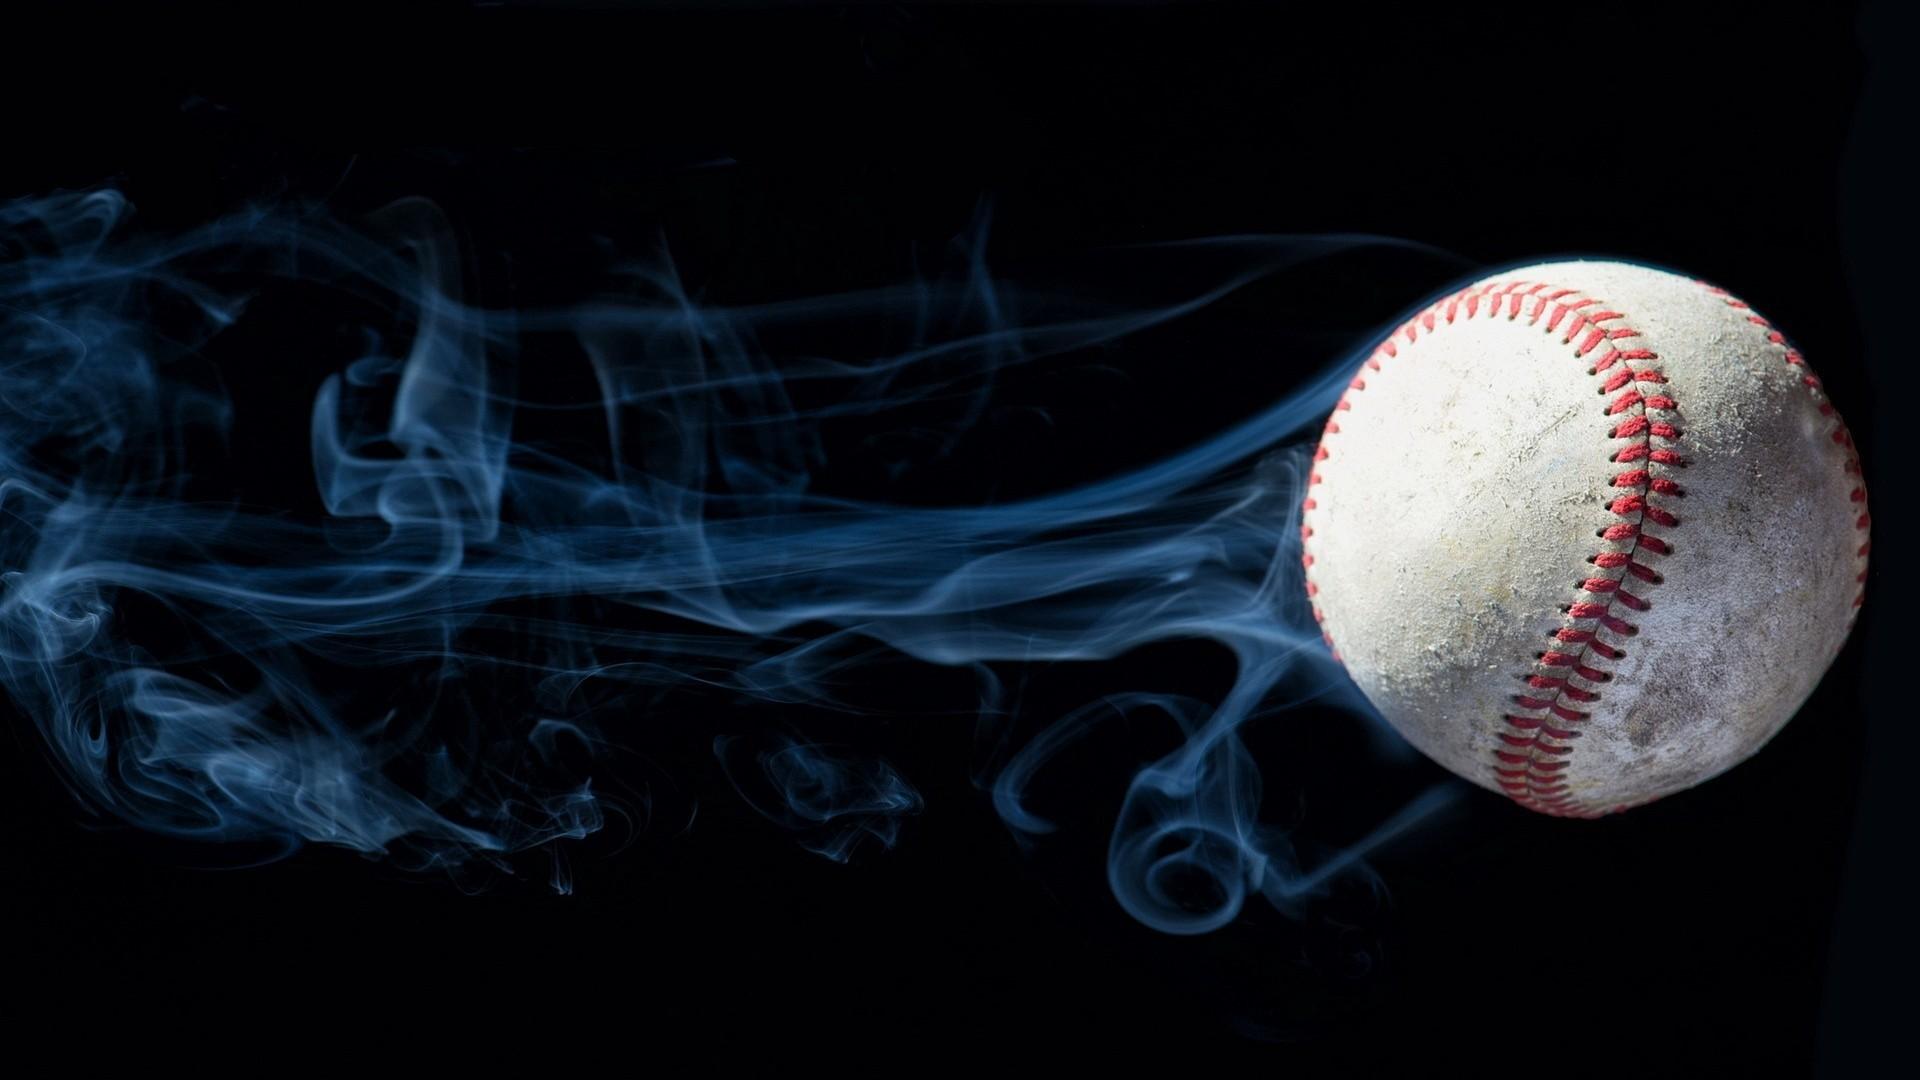 Baseball 1080p Background https://wallpapers-and-backgrounds.net/baseball